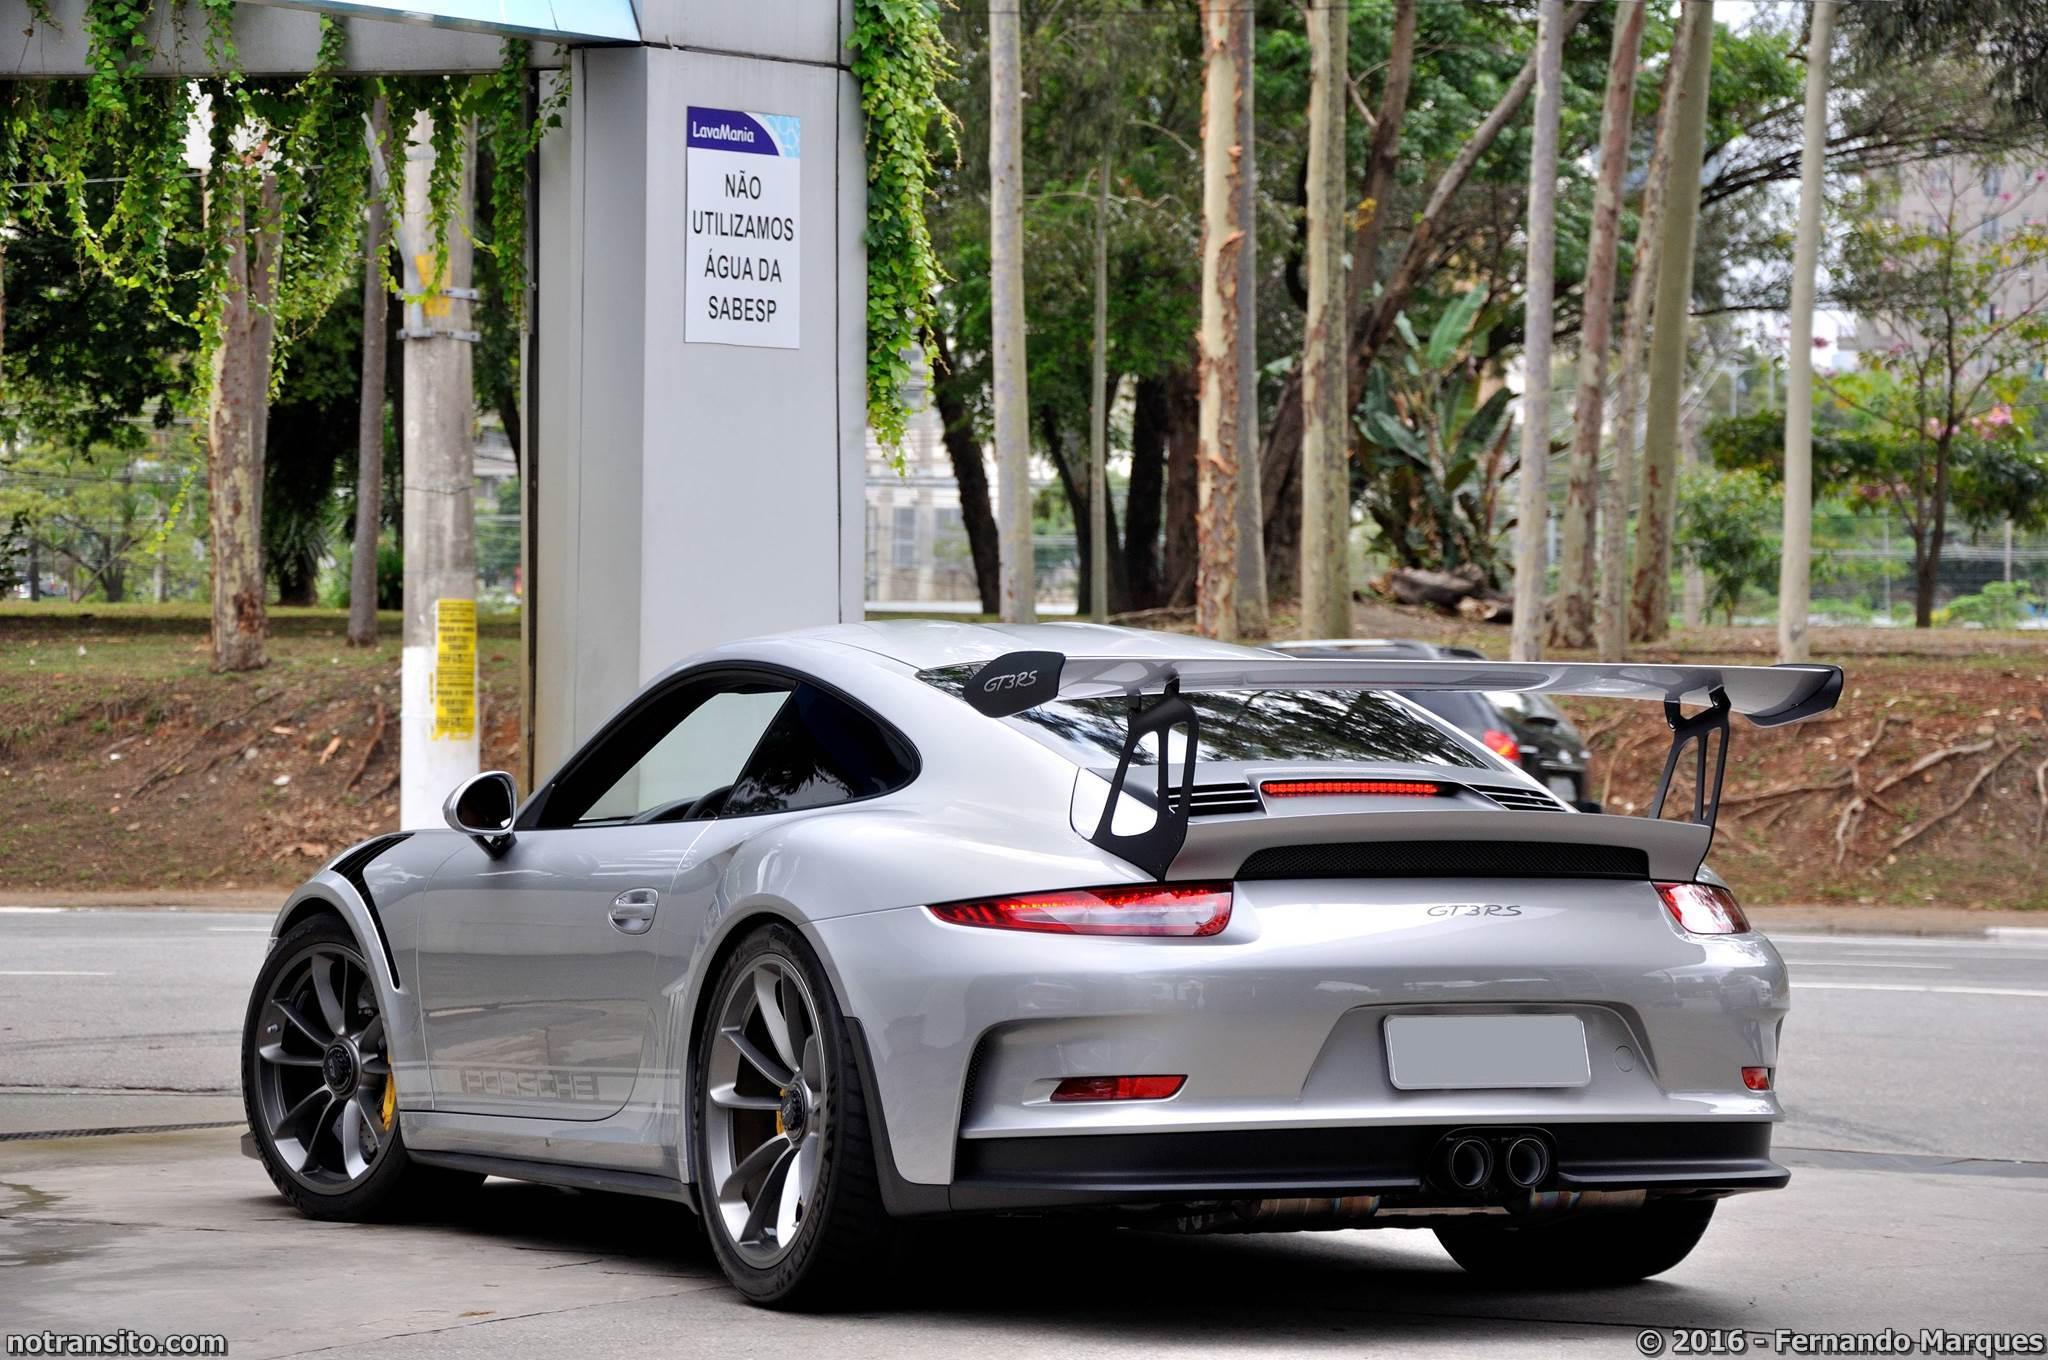 Porsche 911 GT3 RS (991.1) Foto: Fernando Marques